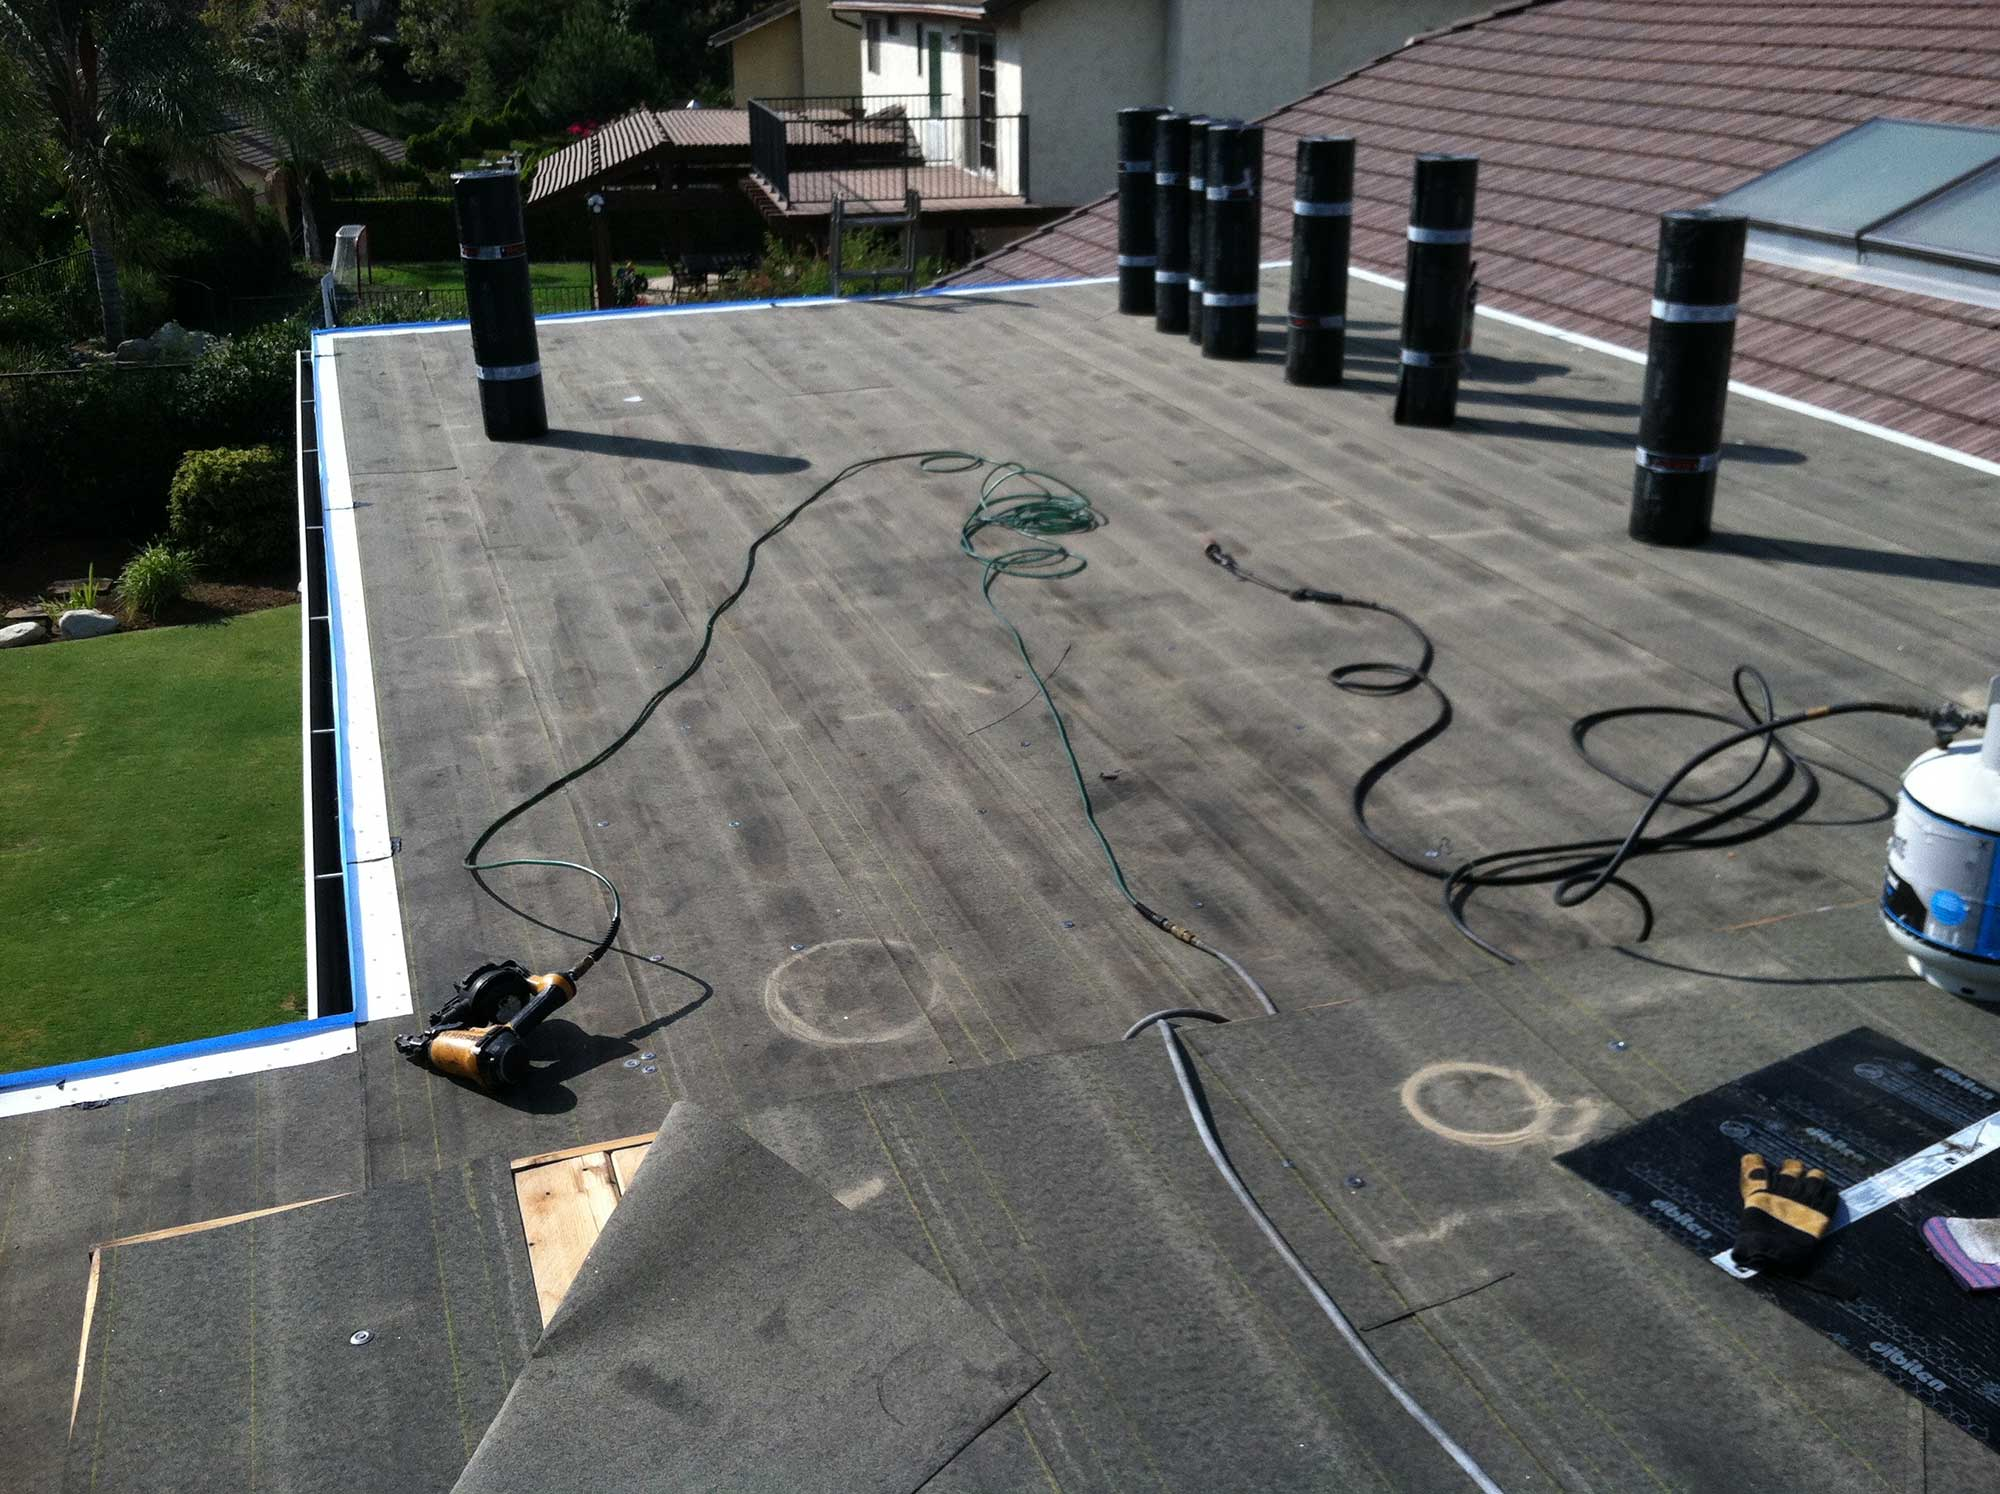 Yorba-Linda-HotAsphalt-Roof-Flat-Roofing